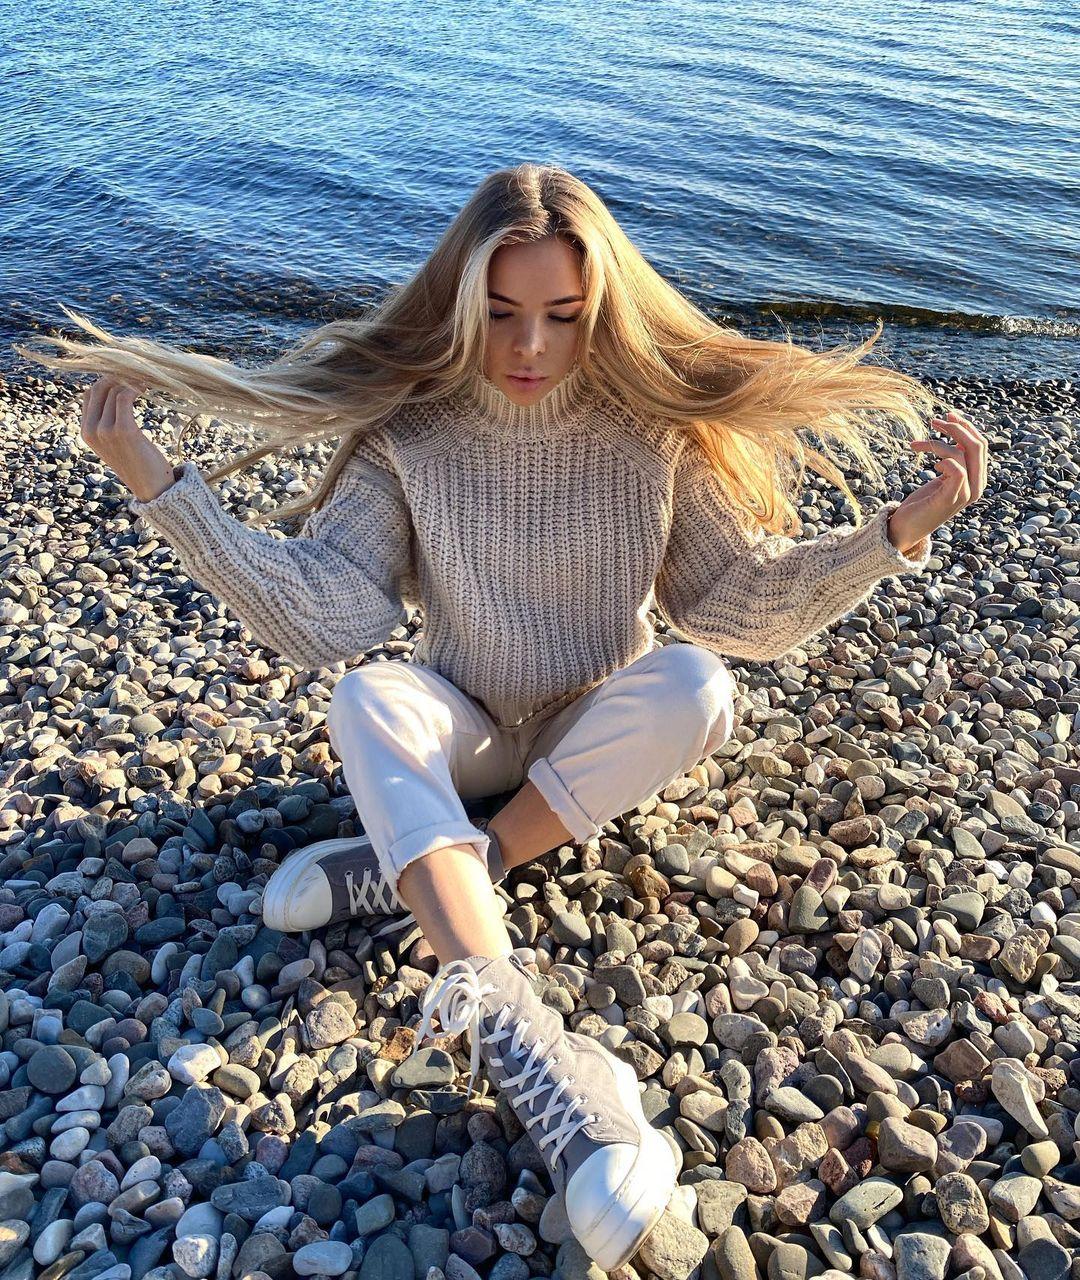 Natalysyakova-Wallpapers-Insta-Fit-Bio-4